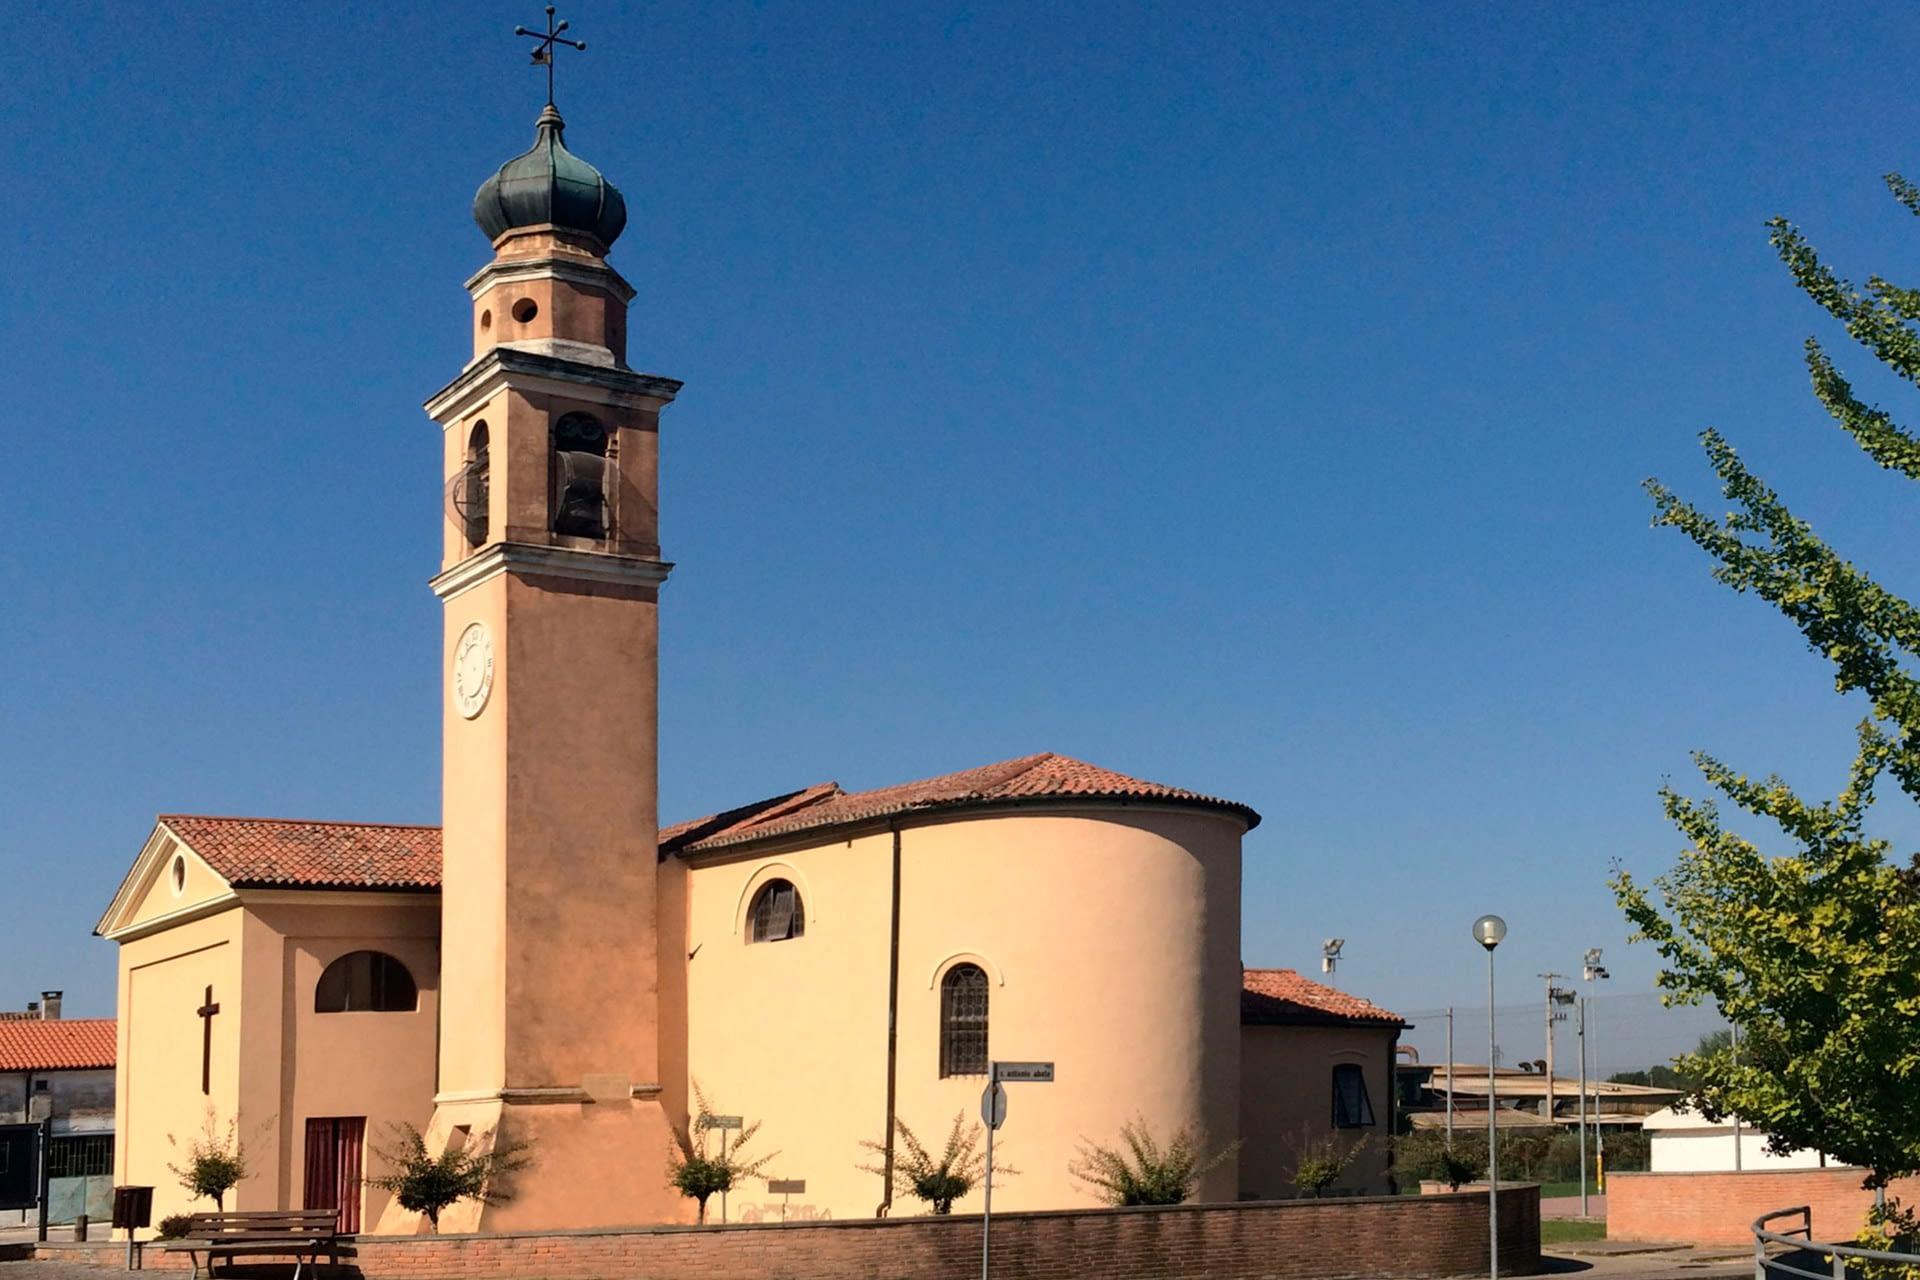 Anguillara Veneta_Chiesa di S. Antonio a Borgoforte